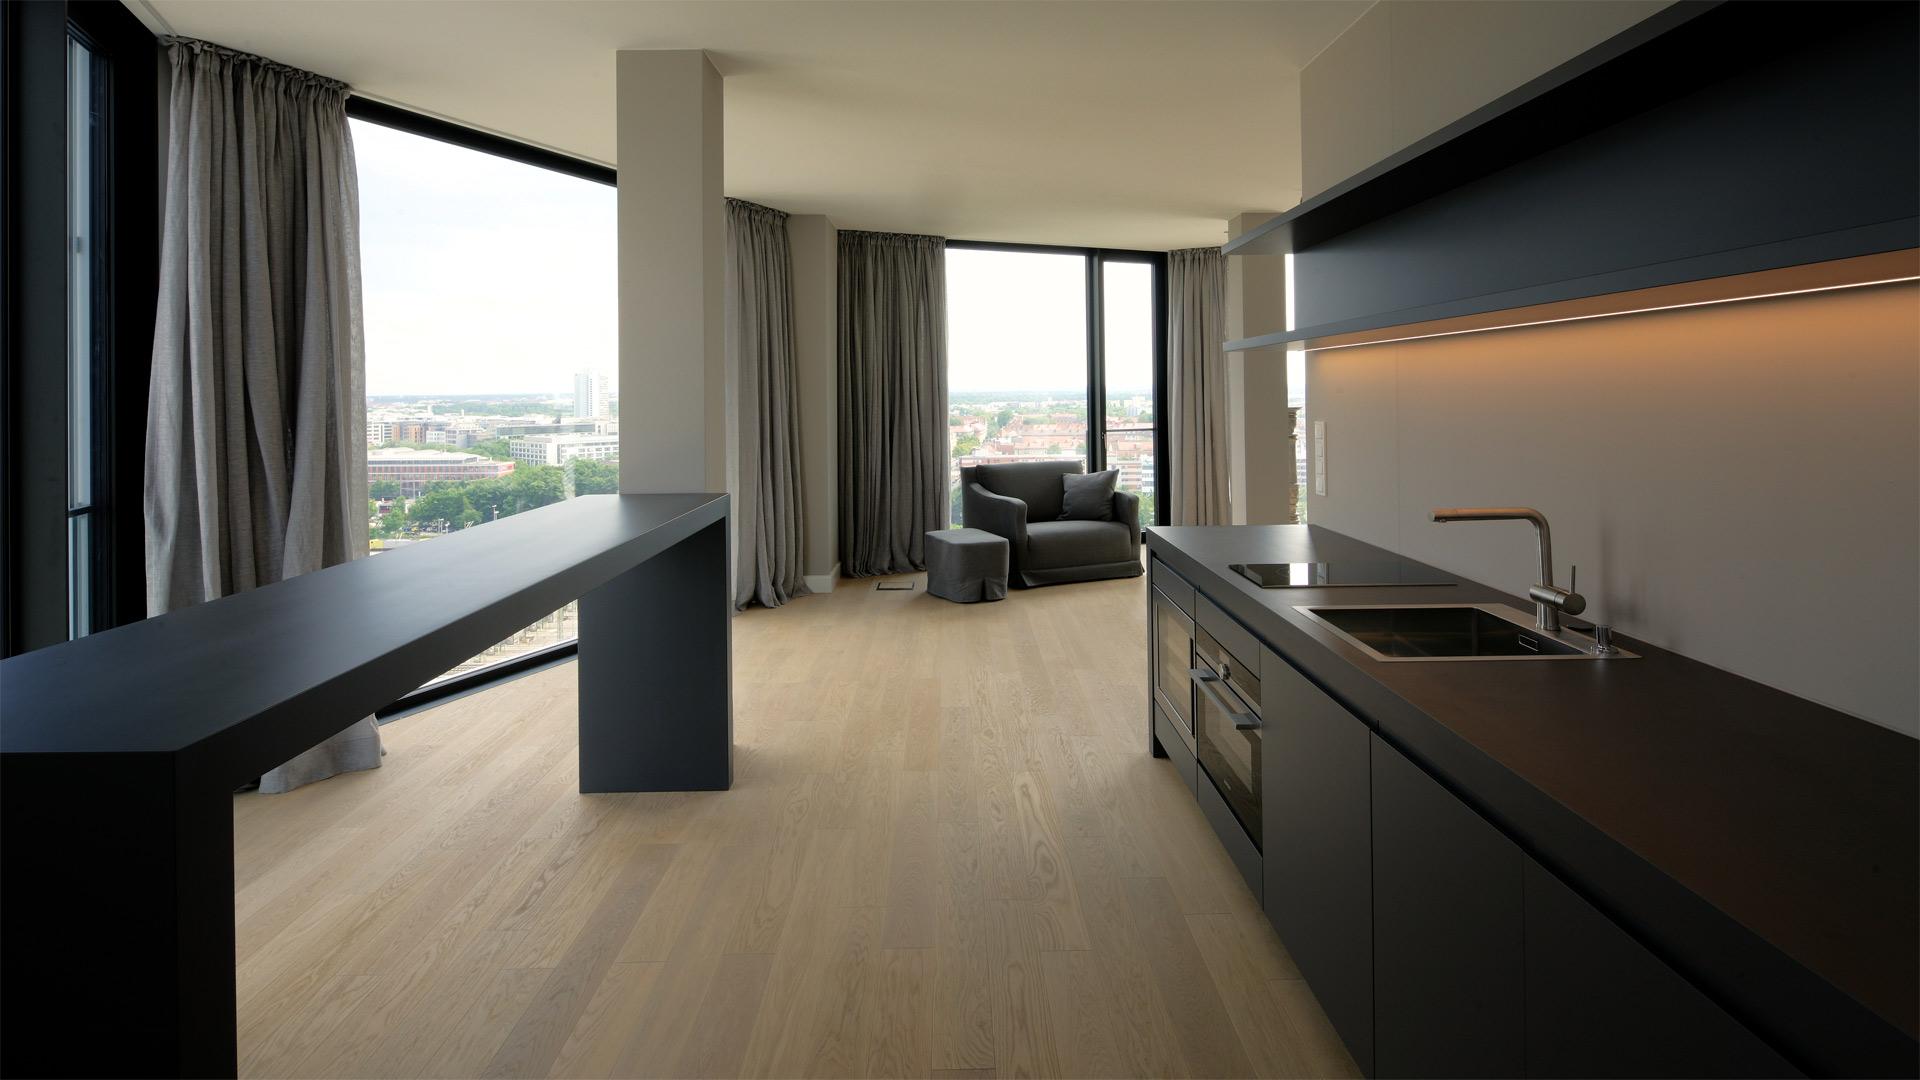 hochwertiger innenausbau. Black Bedroom Furniture Sets. Home Design Ideas